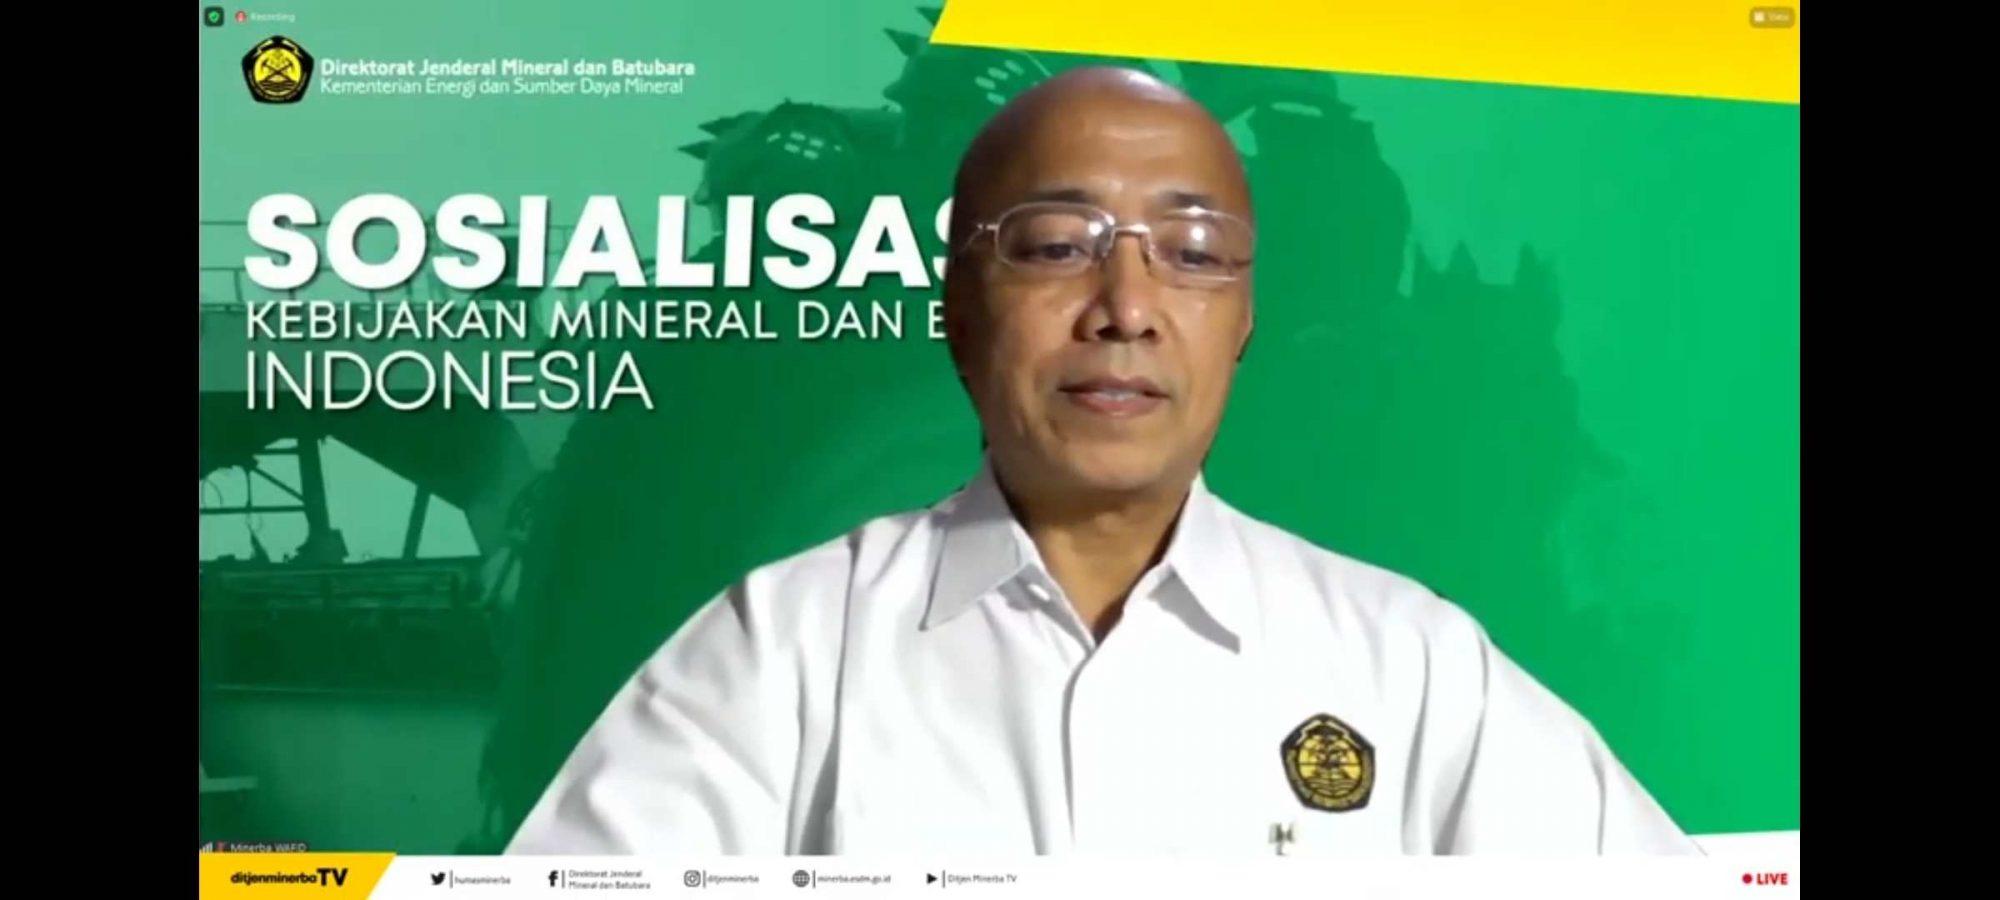 Direktur Penerimaan Minerba Kementerian ESDM